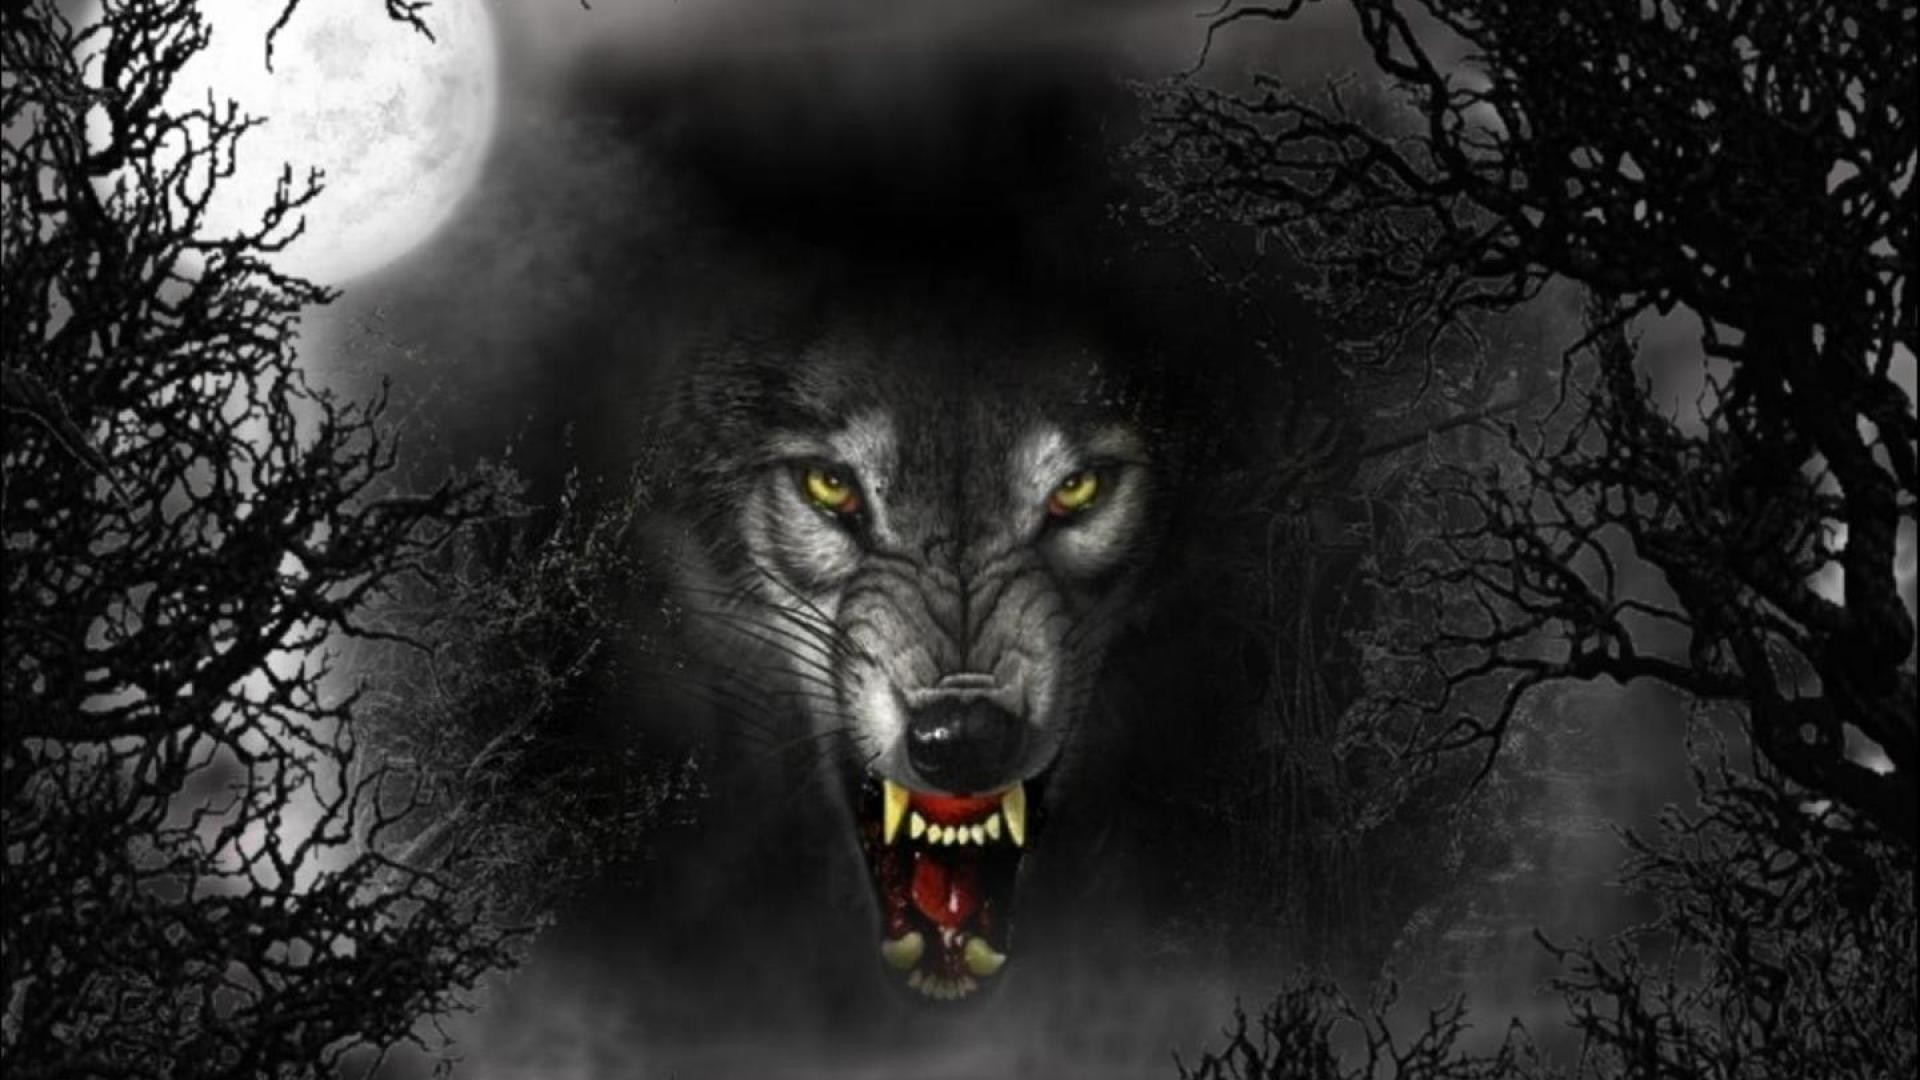 Scary Werewolf High Resolution HD Wallpaper – Beraplan.